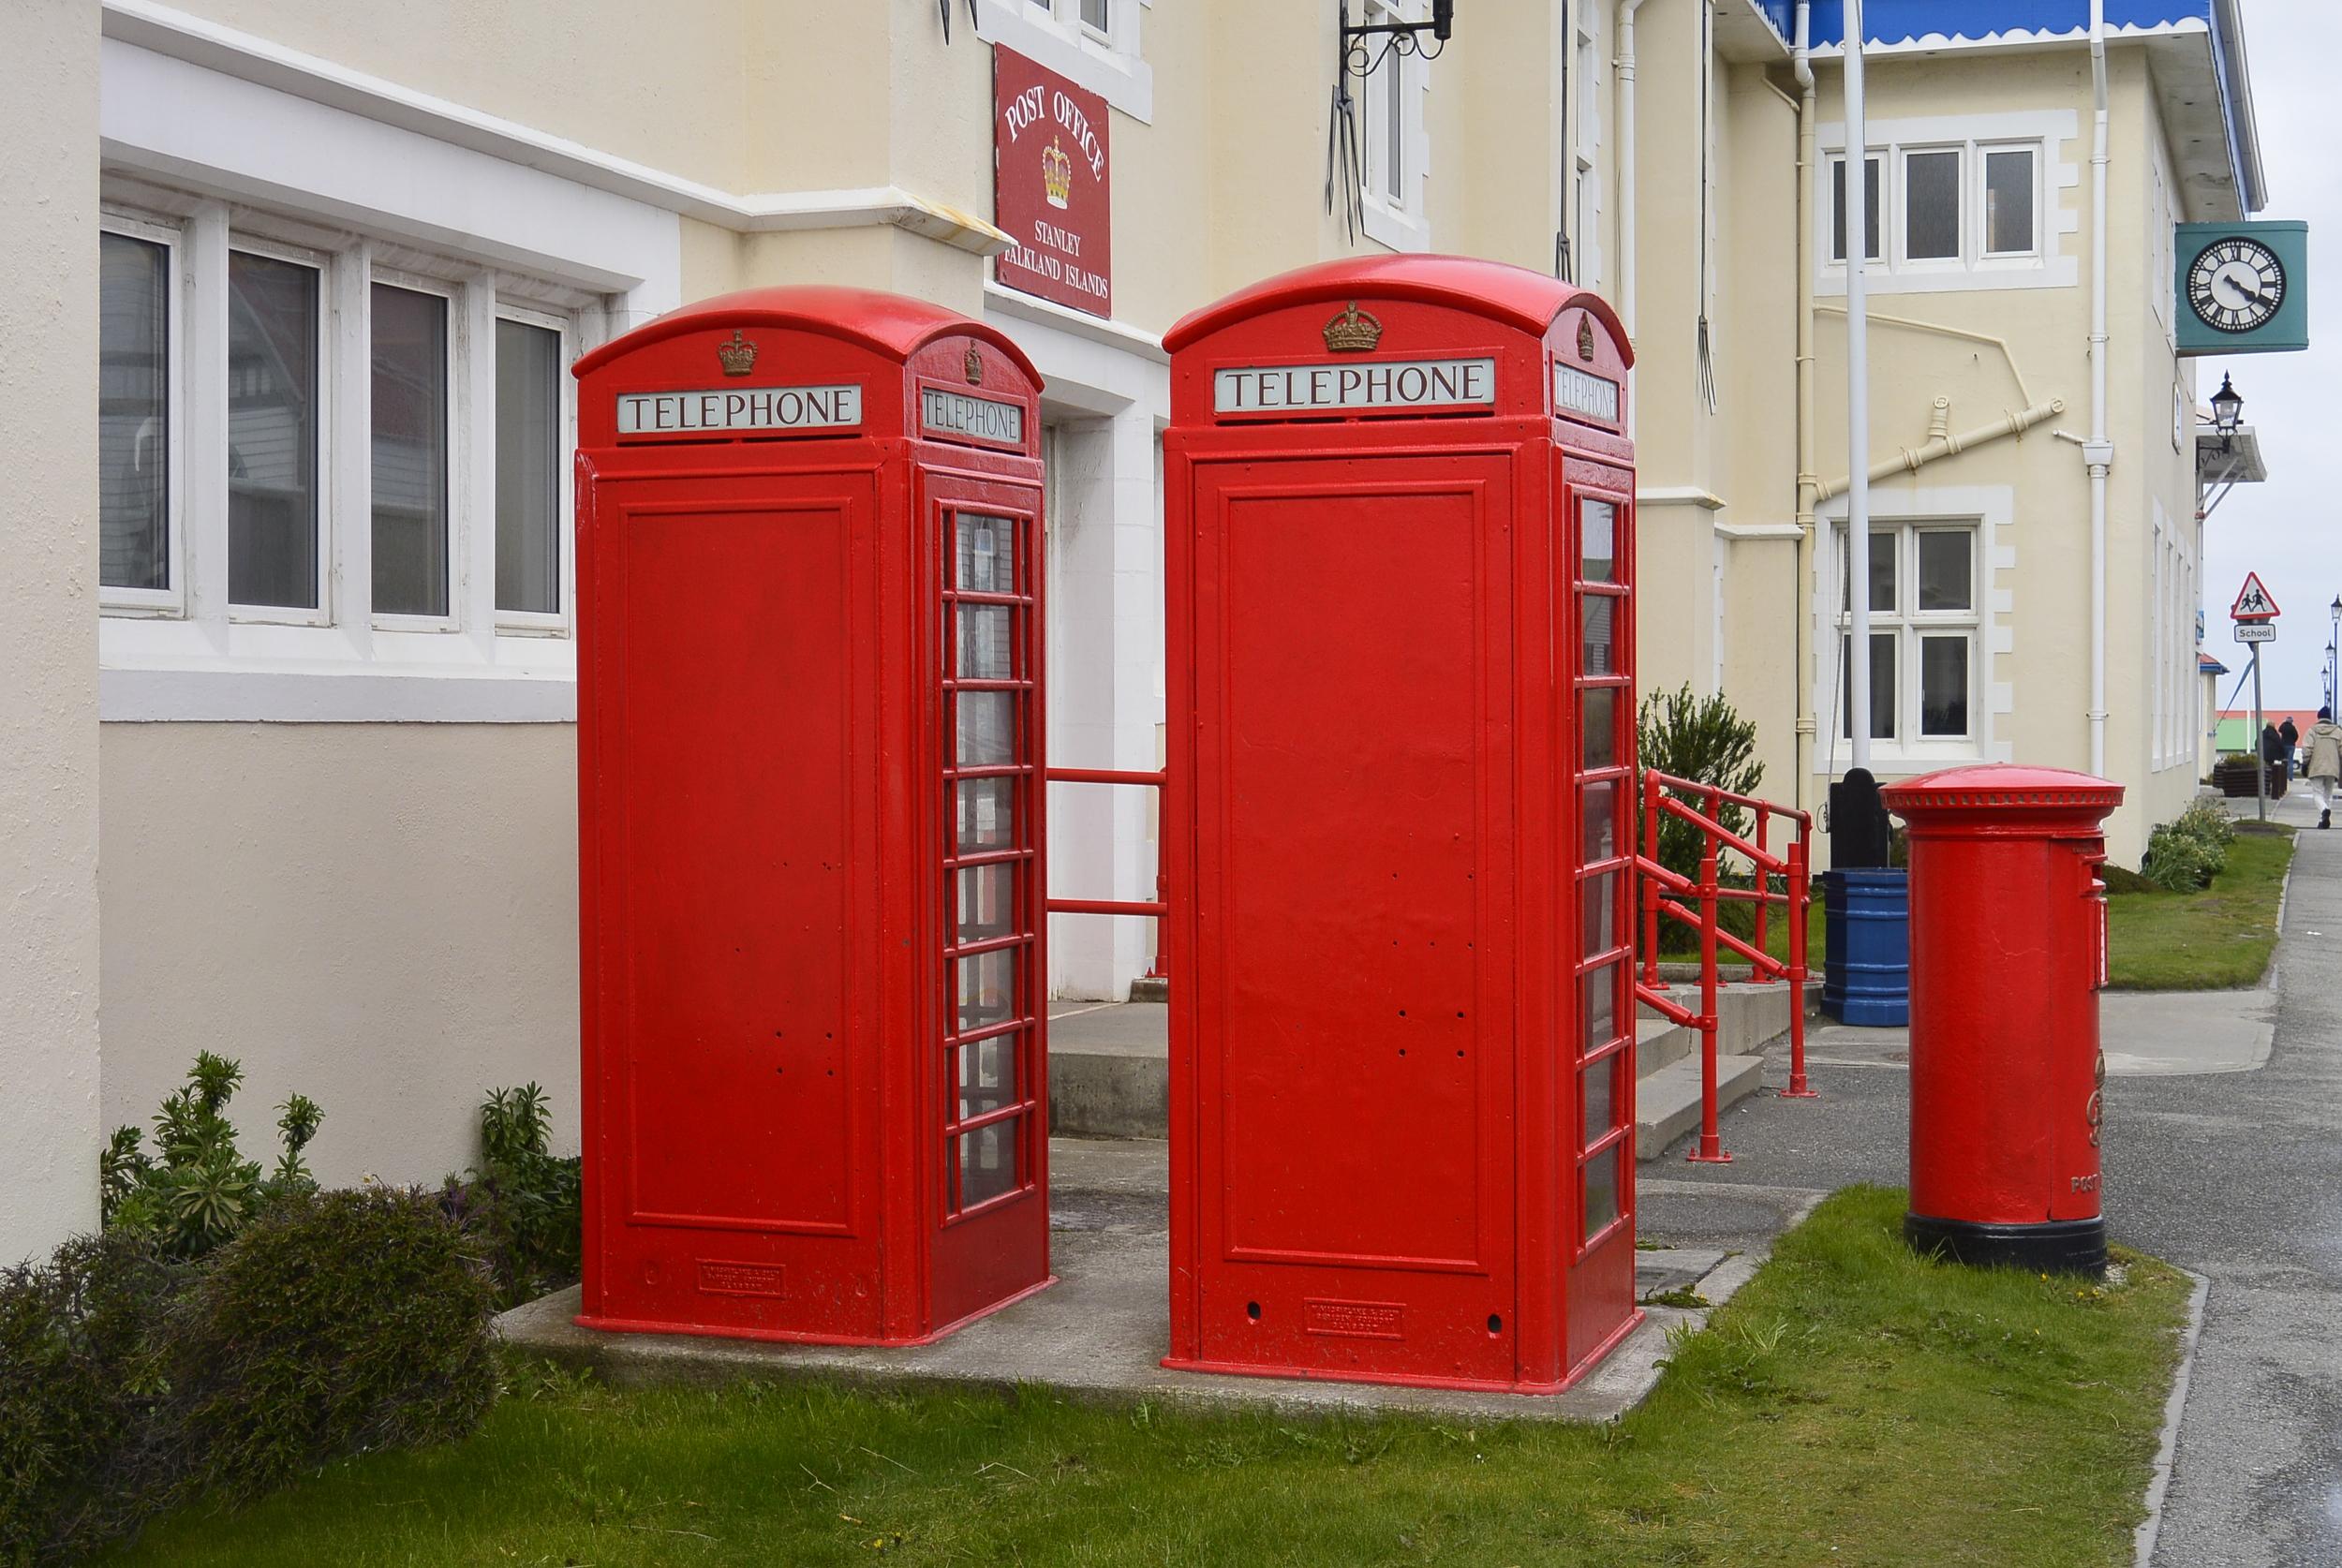 Stanley Falkland Islands Telephone